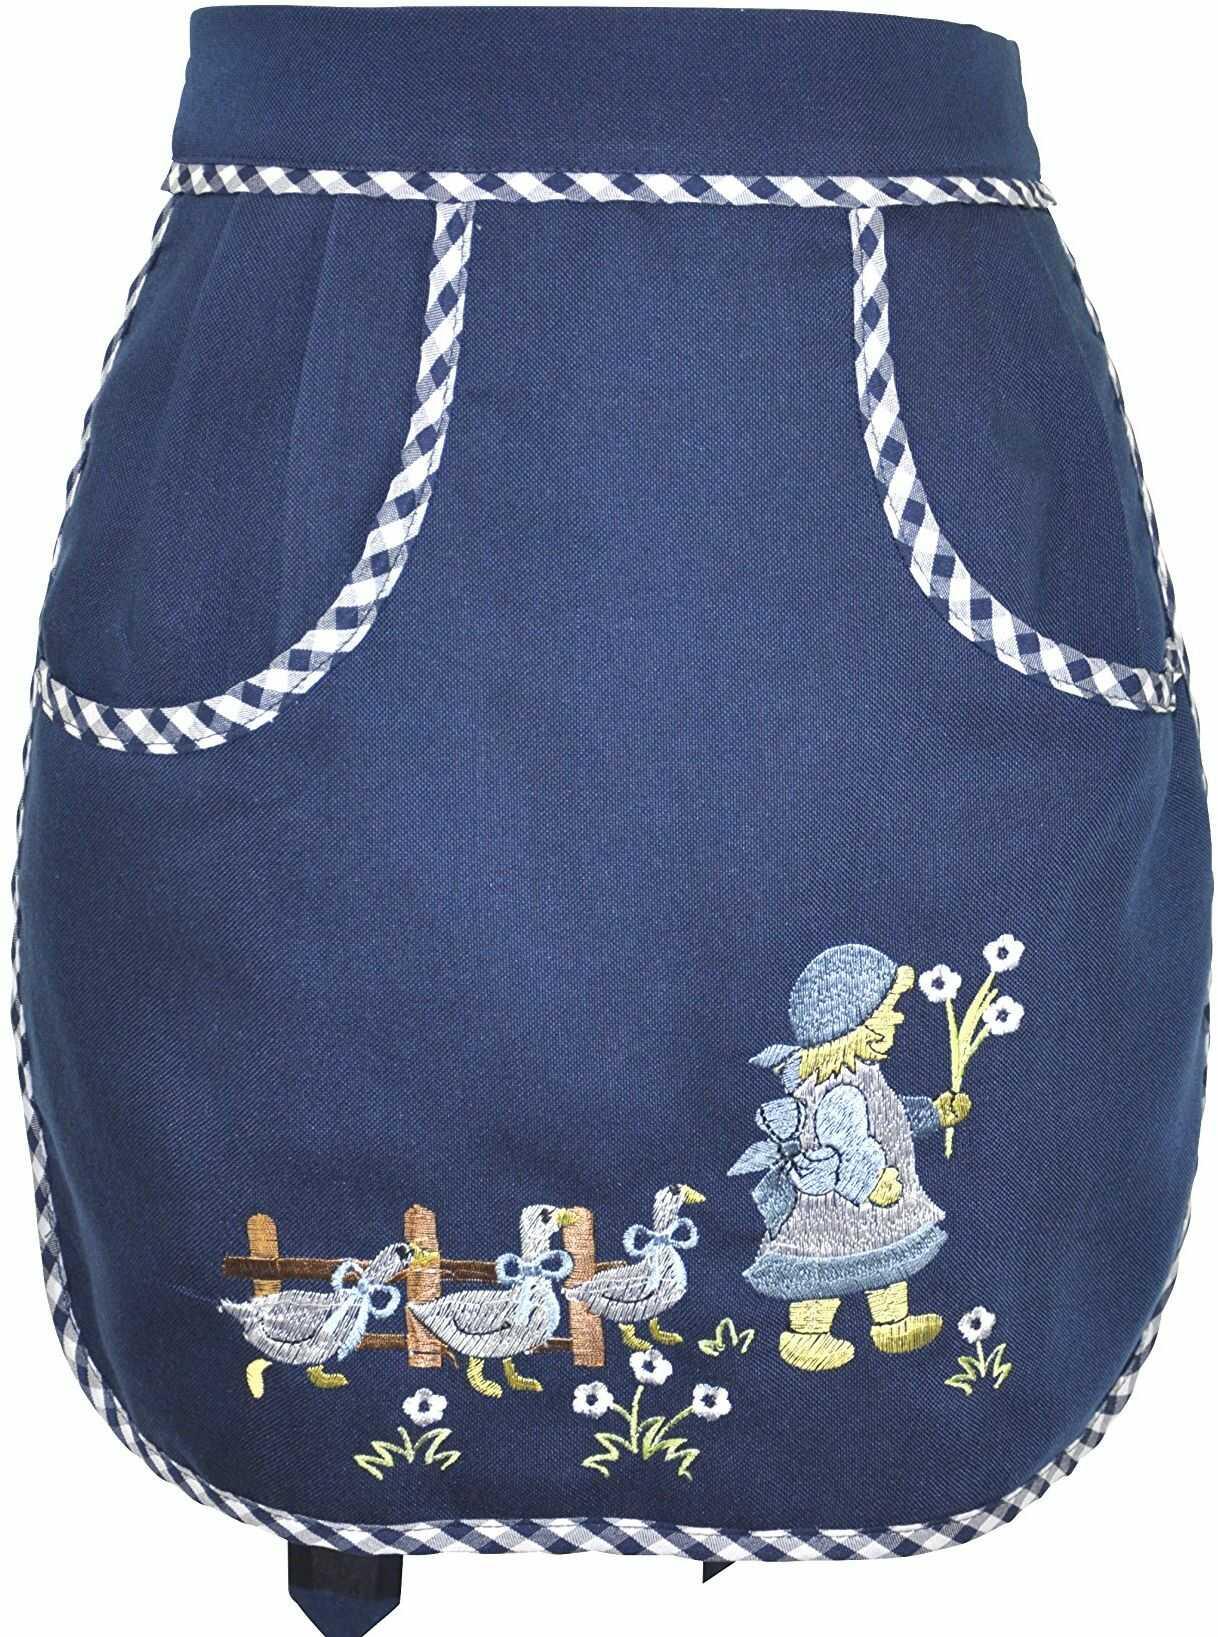 Bellanda fartuch na klamerki, poliester, niebieski, 46 x 42 x 0,5 cm